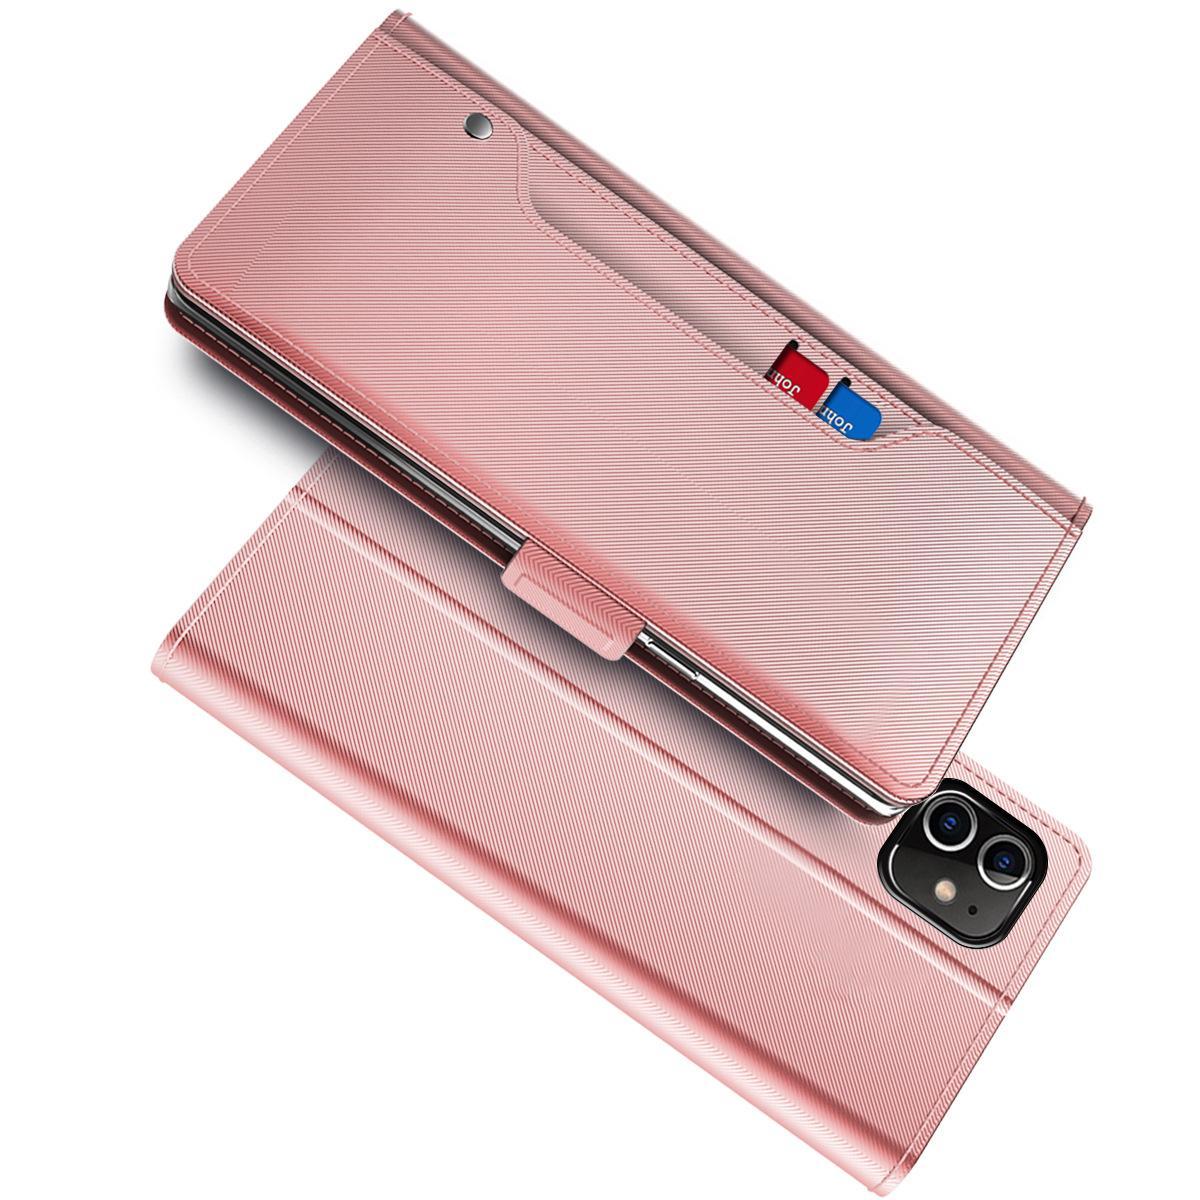 Plånboksfodral Spegel iPhone 12/12 Pro Rosa Guld